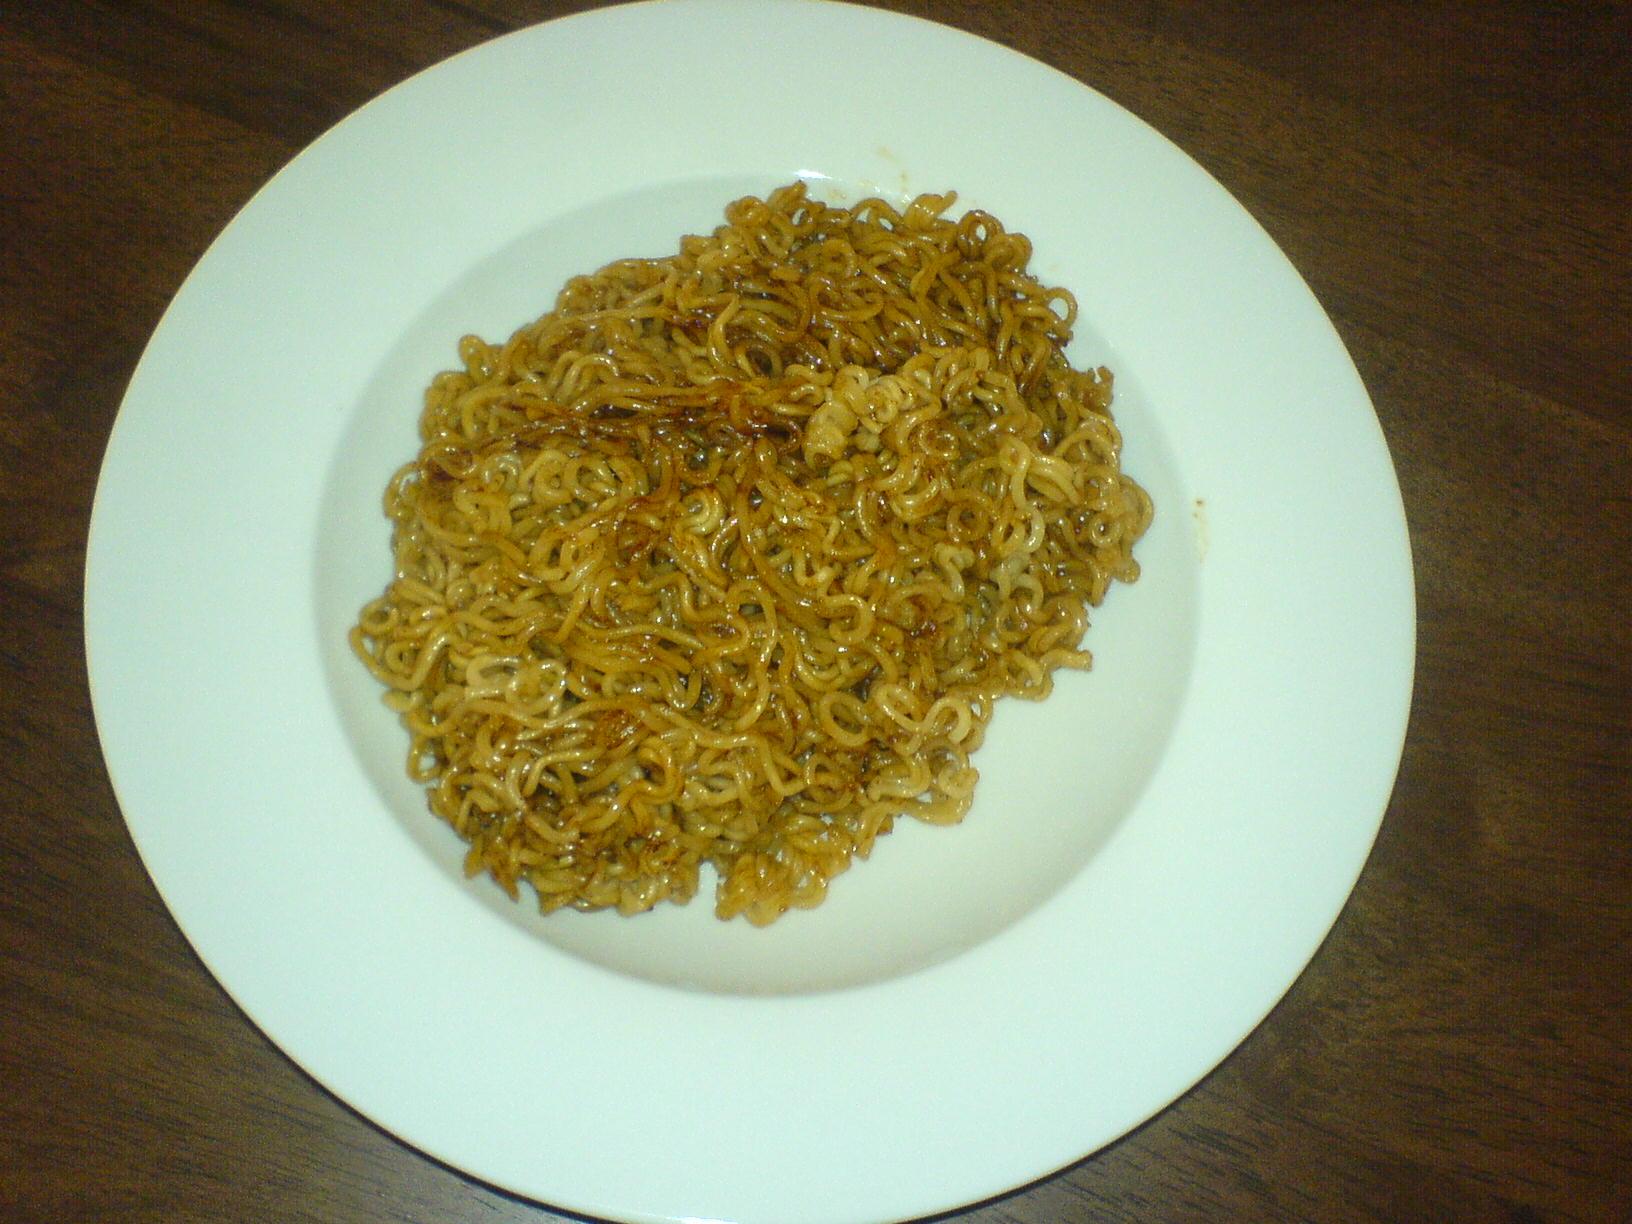 http://foodloader.net/Holz_2011-04-02_Asianudeln.jpg